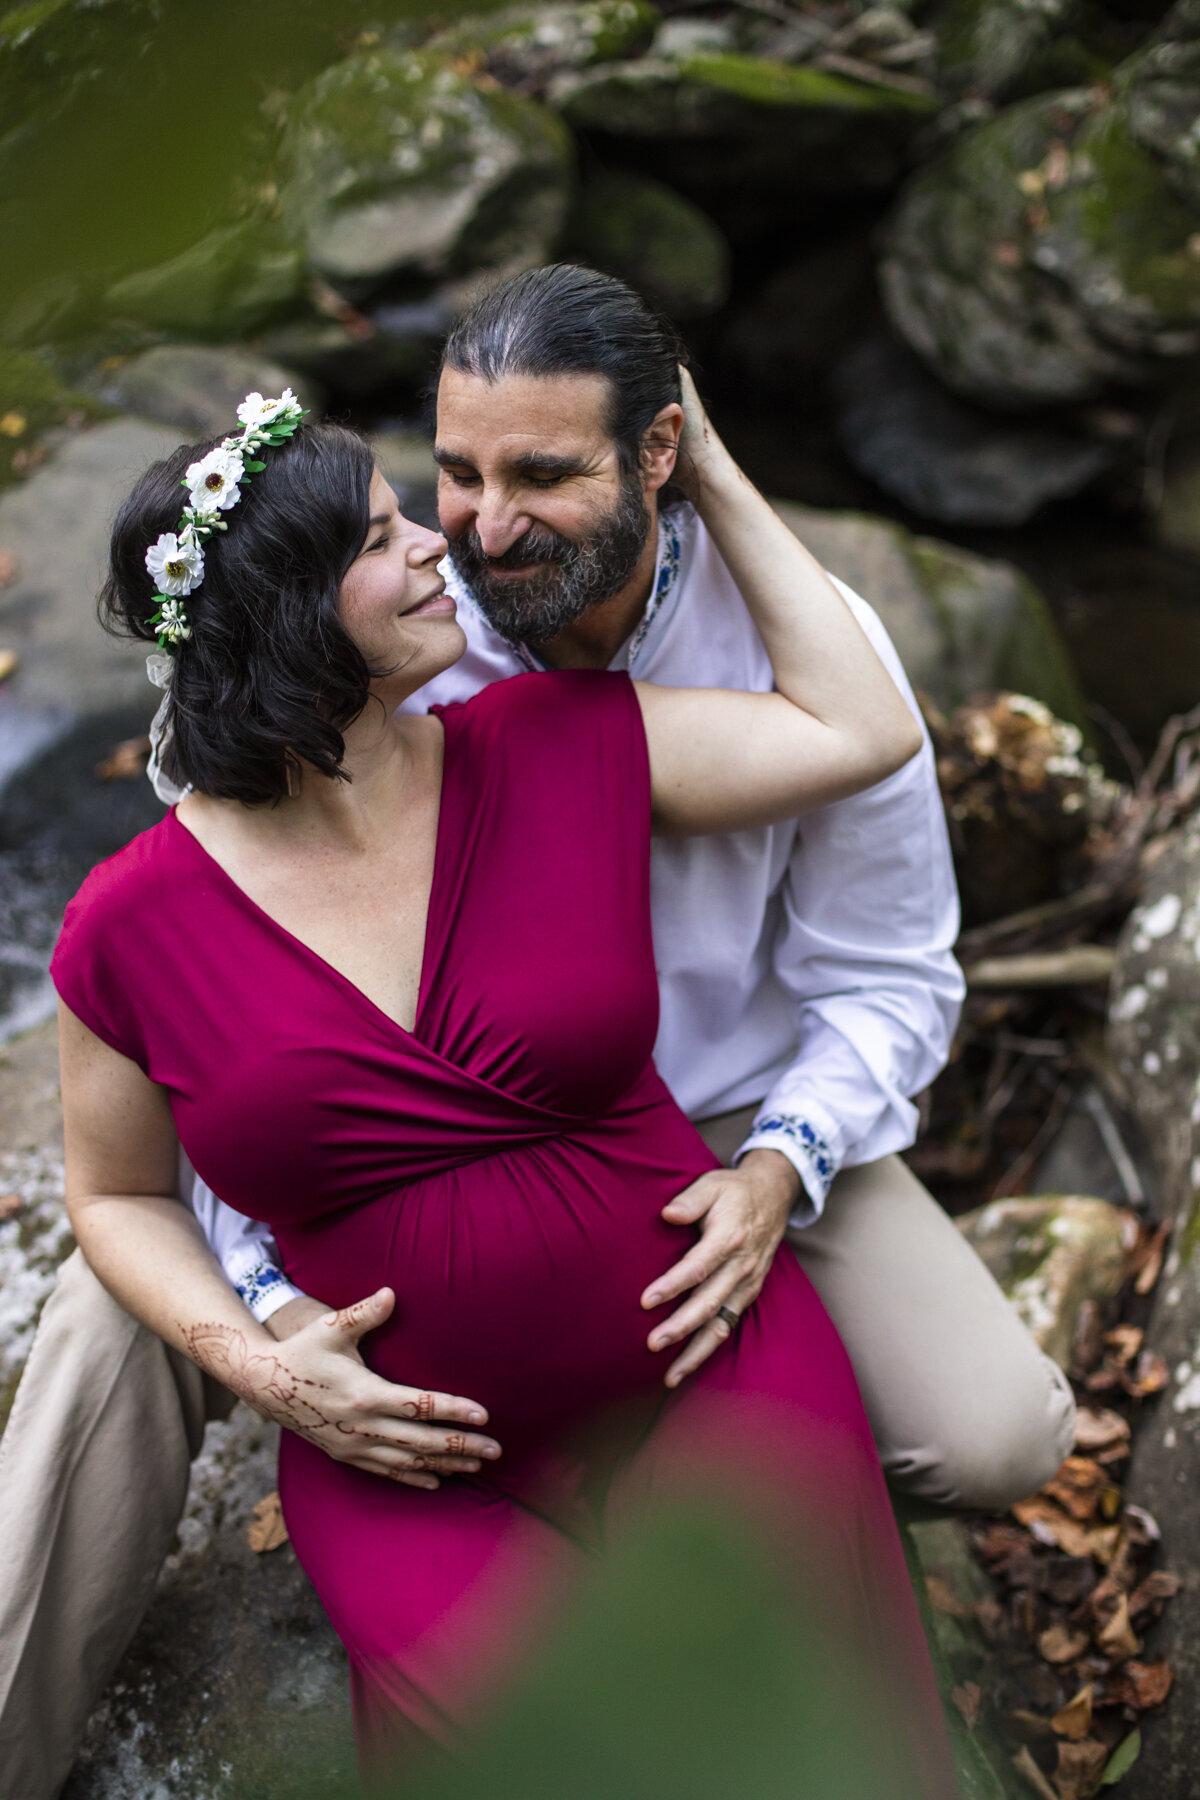 Avyanna and Phoenix Maternity Session 2019_photos by Studio Misha_BLOG-41.jpg